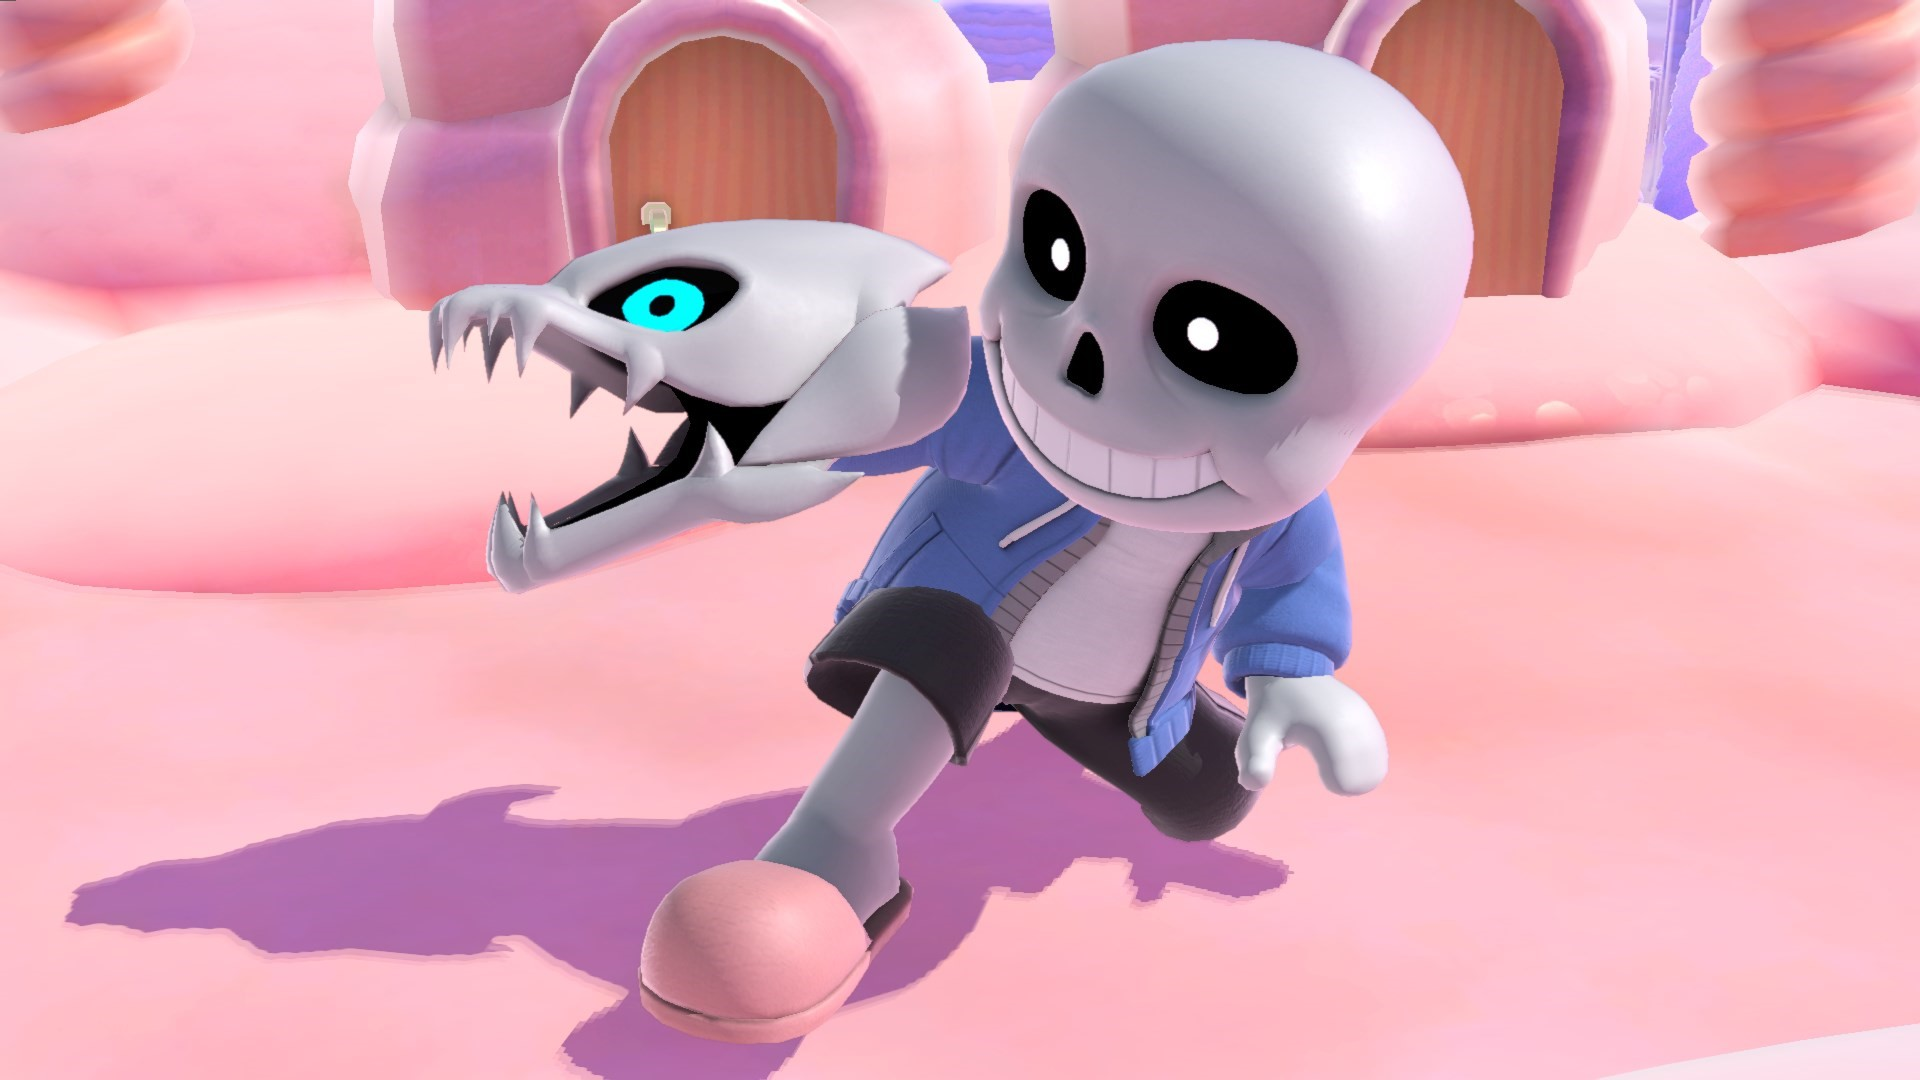 Super Smash Bros. Ultimate screenshots – Banjo-Kazooie, Home-Run Contest, Mii Fighter costumes